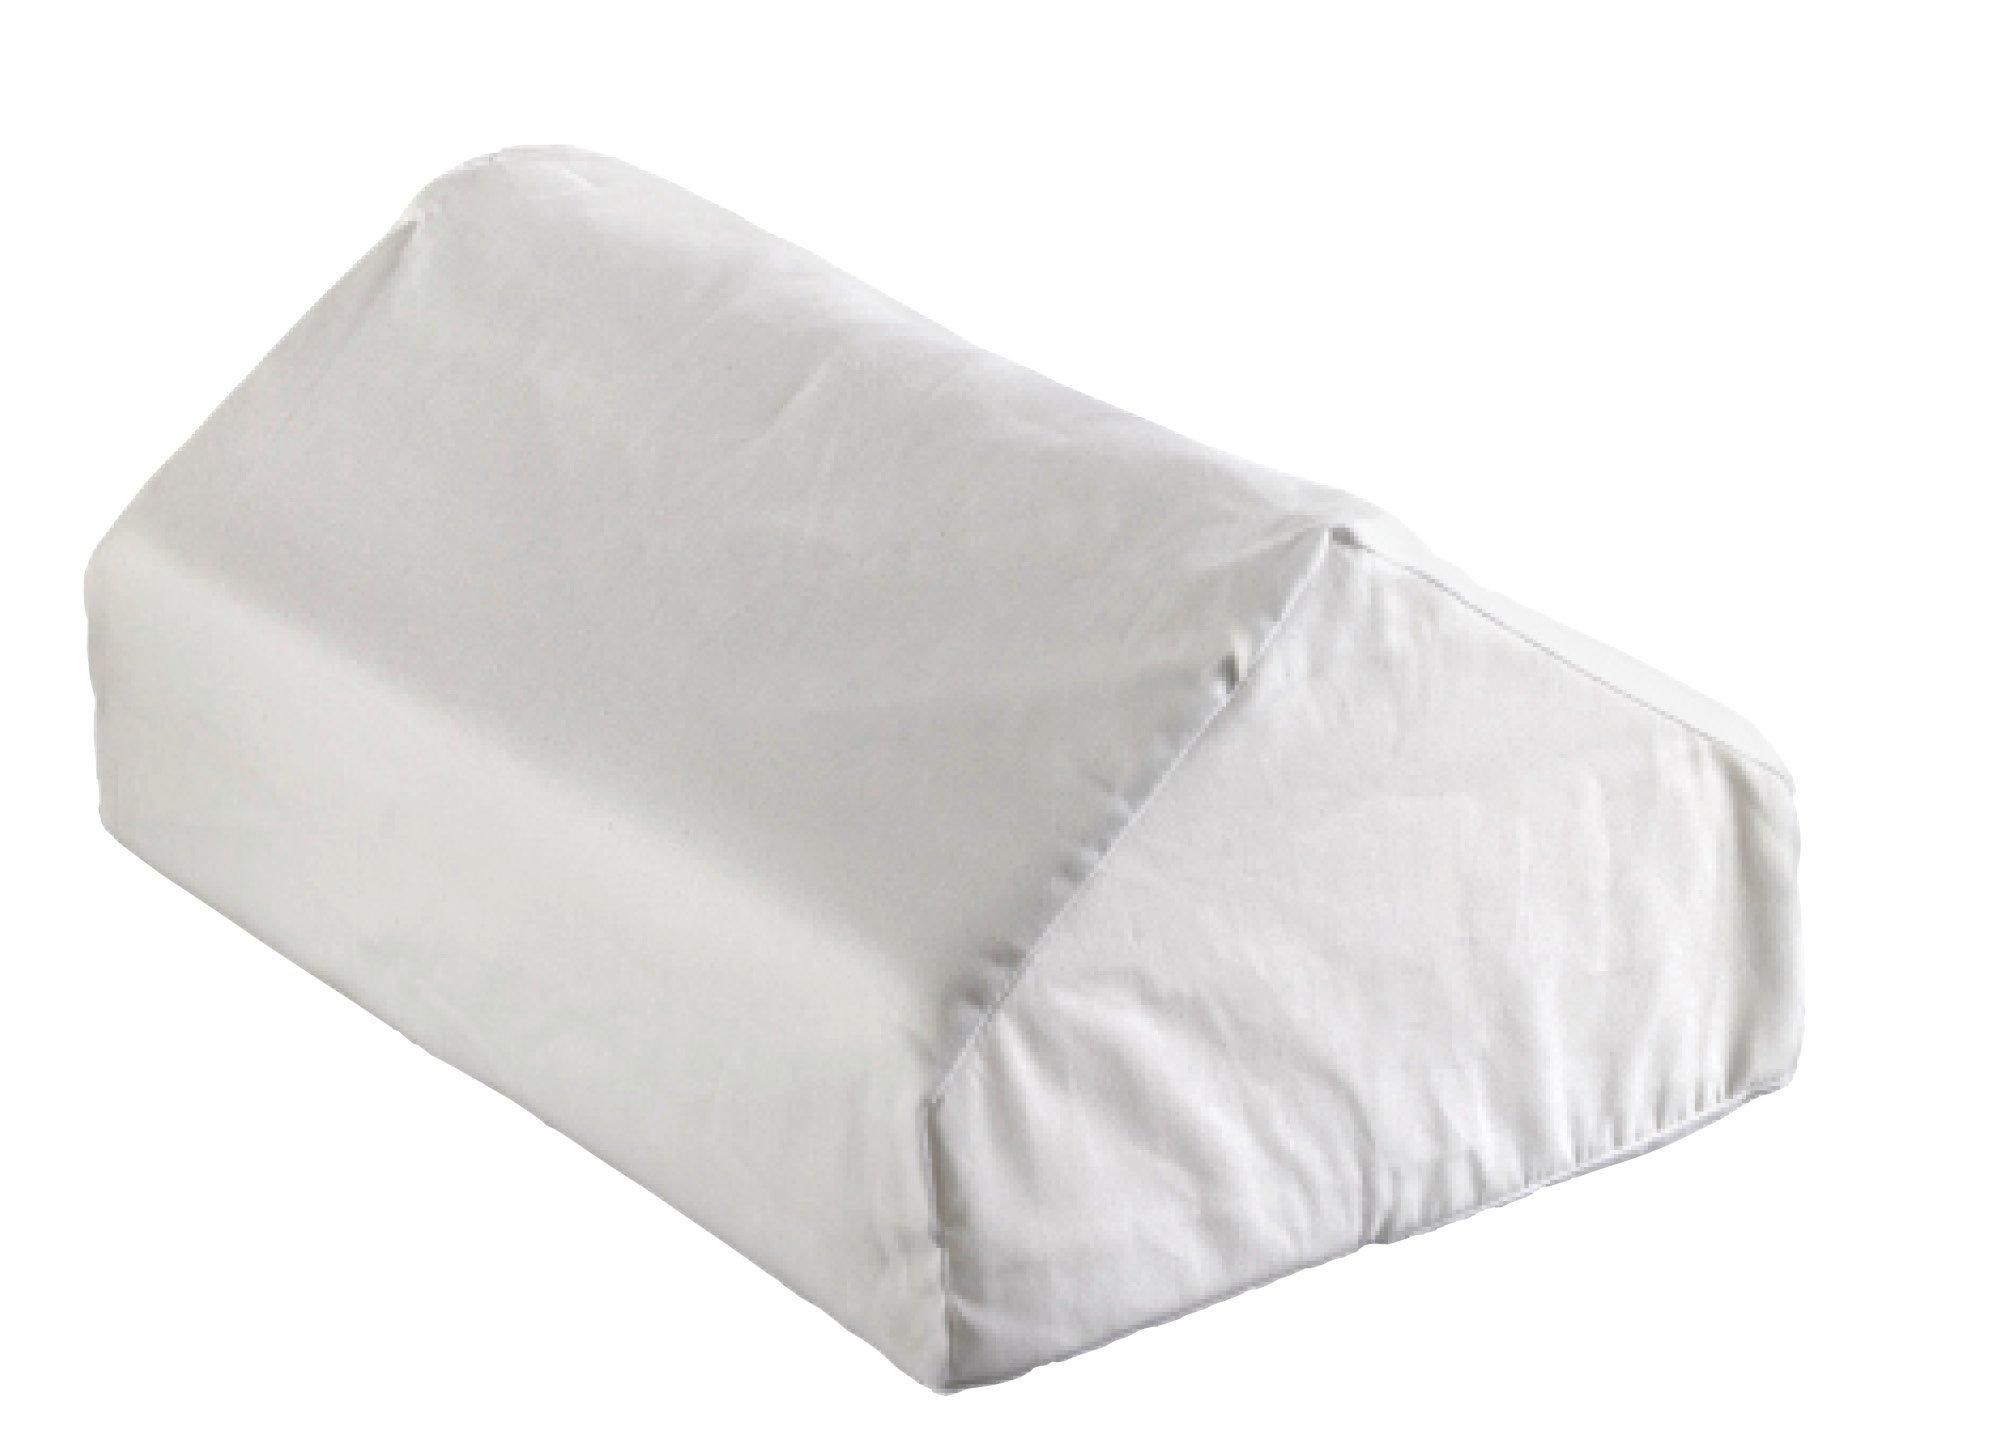 Bilt-Rite Mastex Health Knee Rest Pillow, White